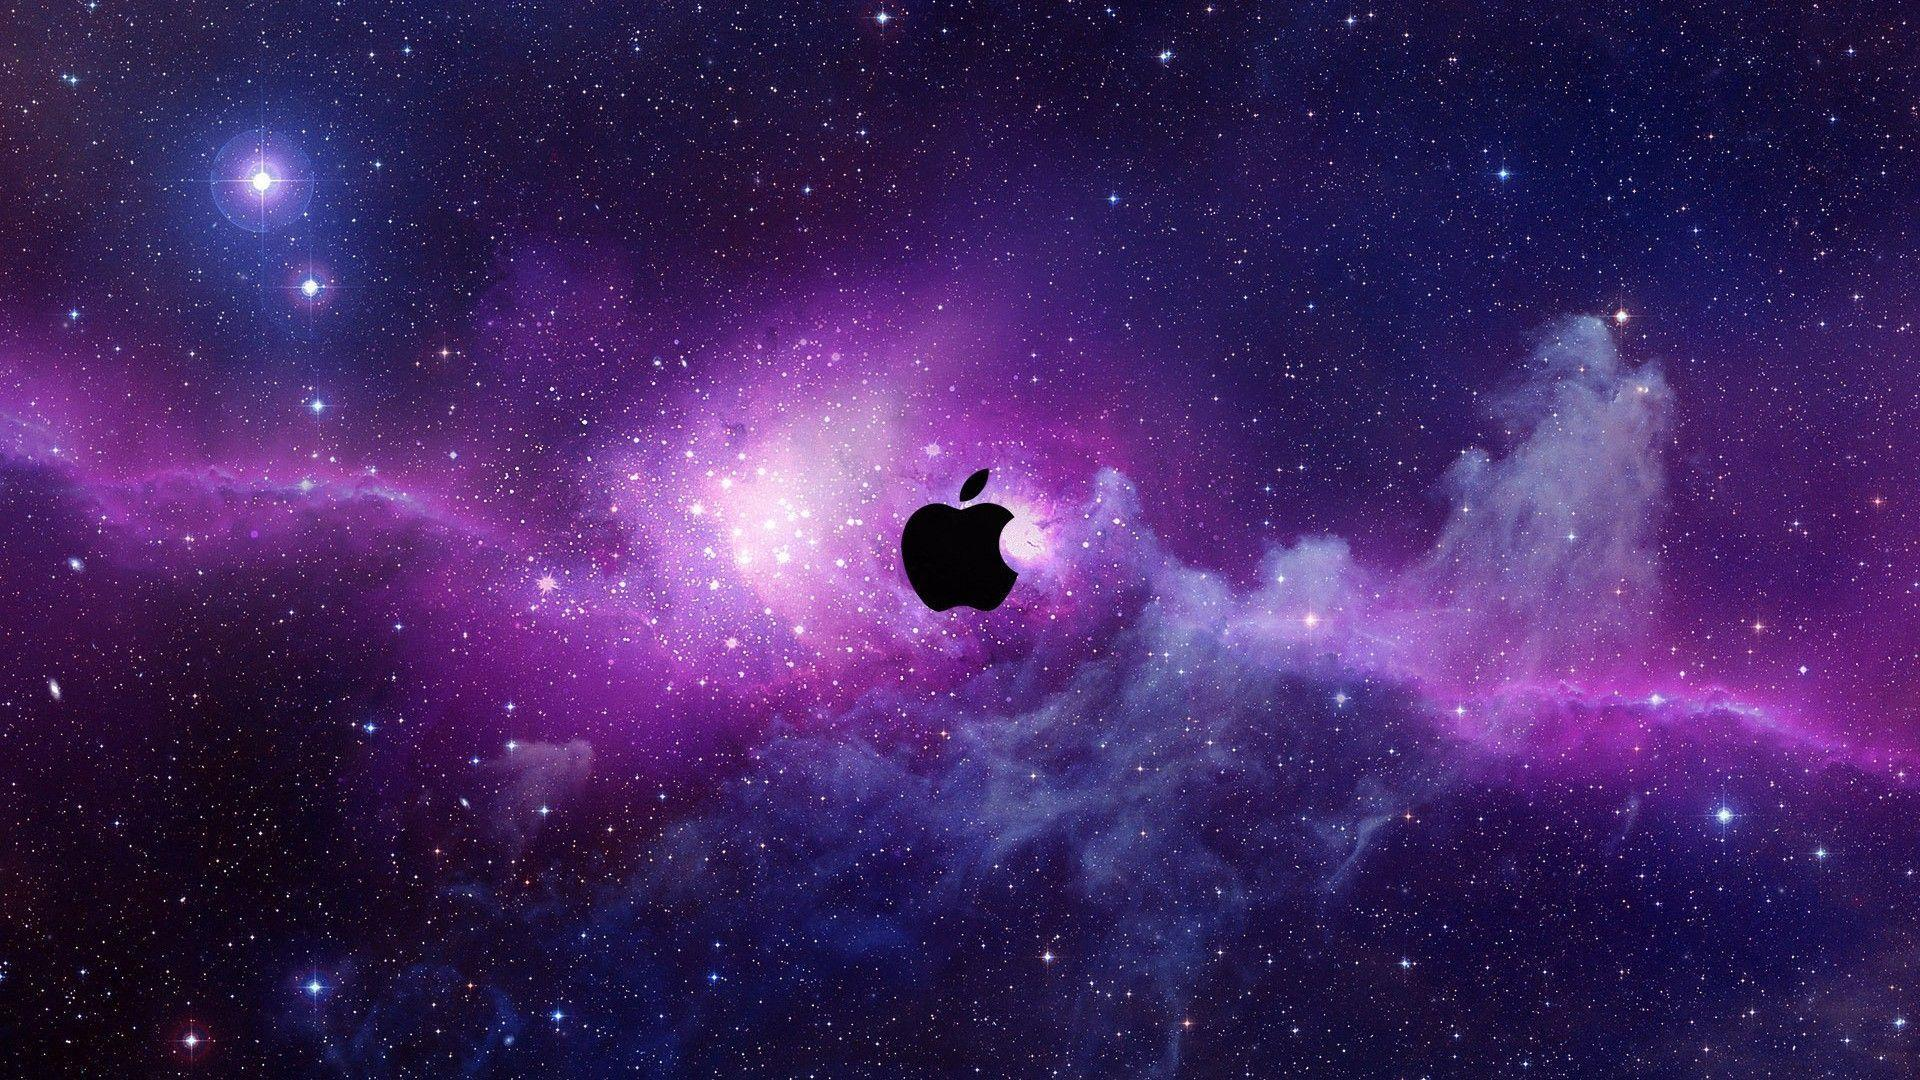 purple apple wallpapers - wallpaper cave